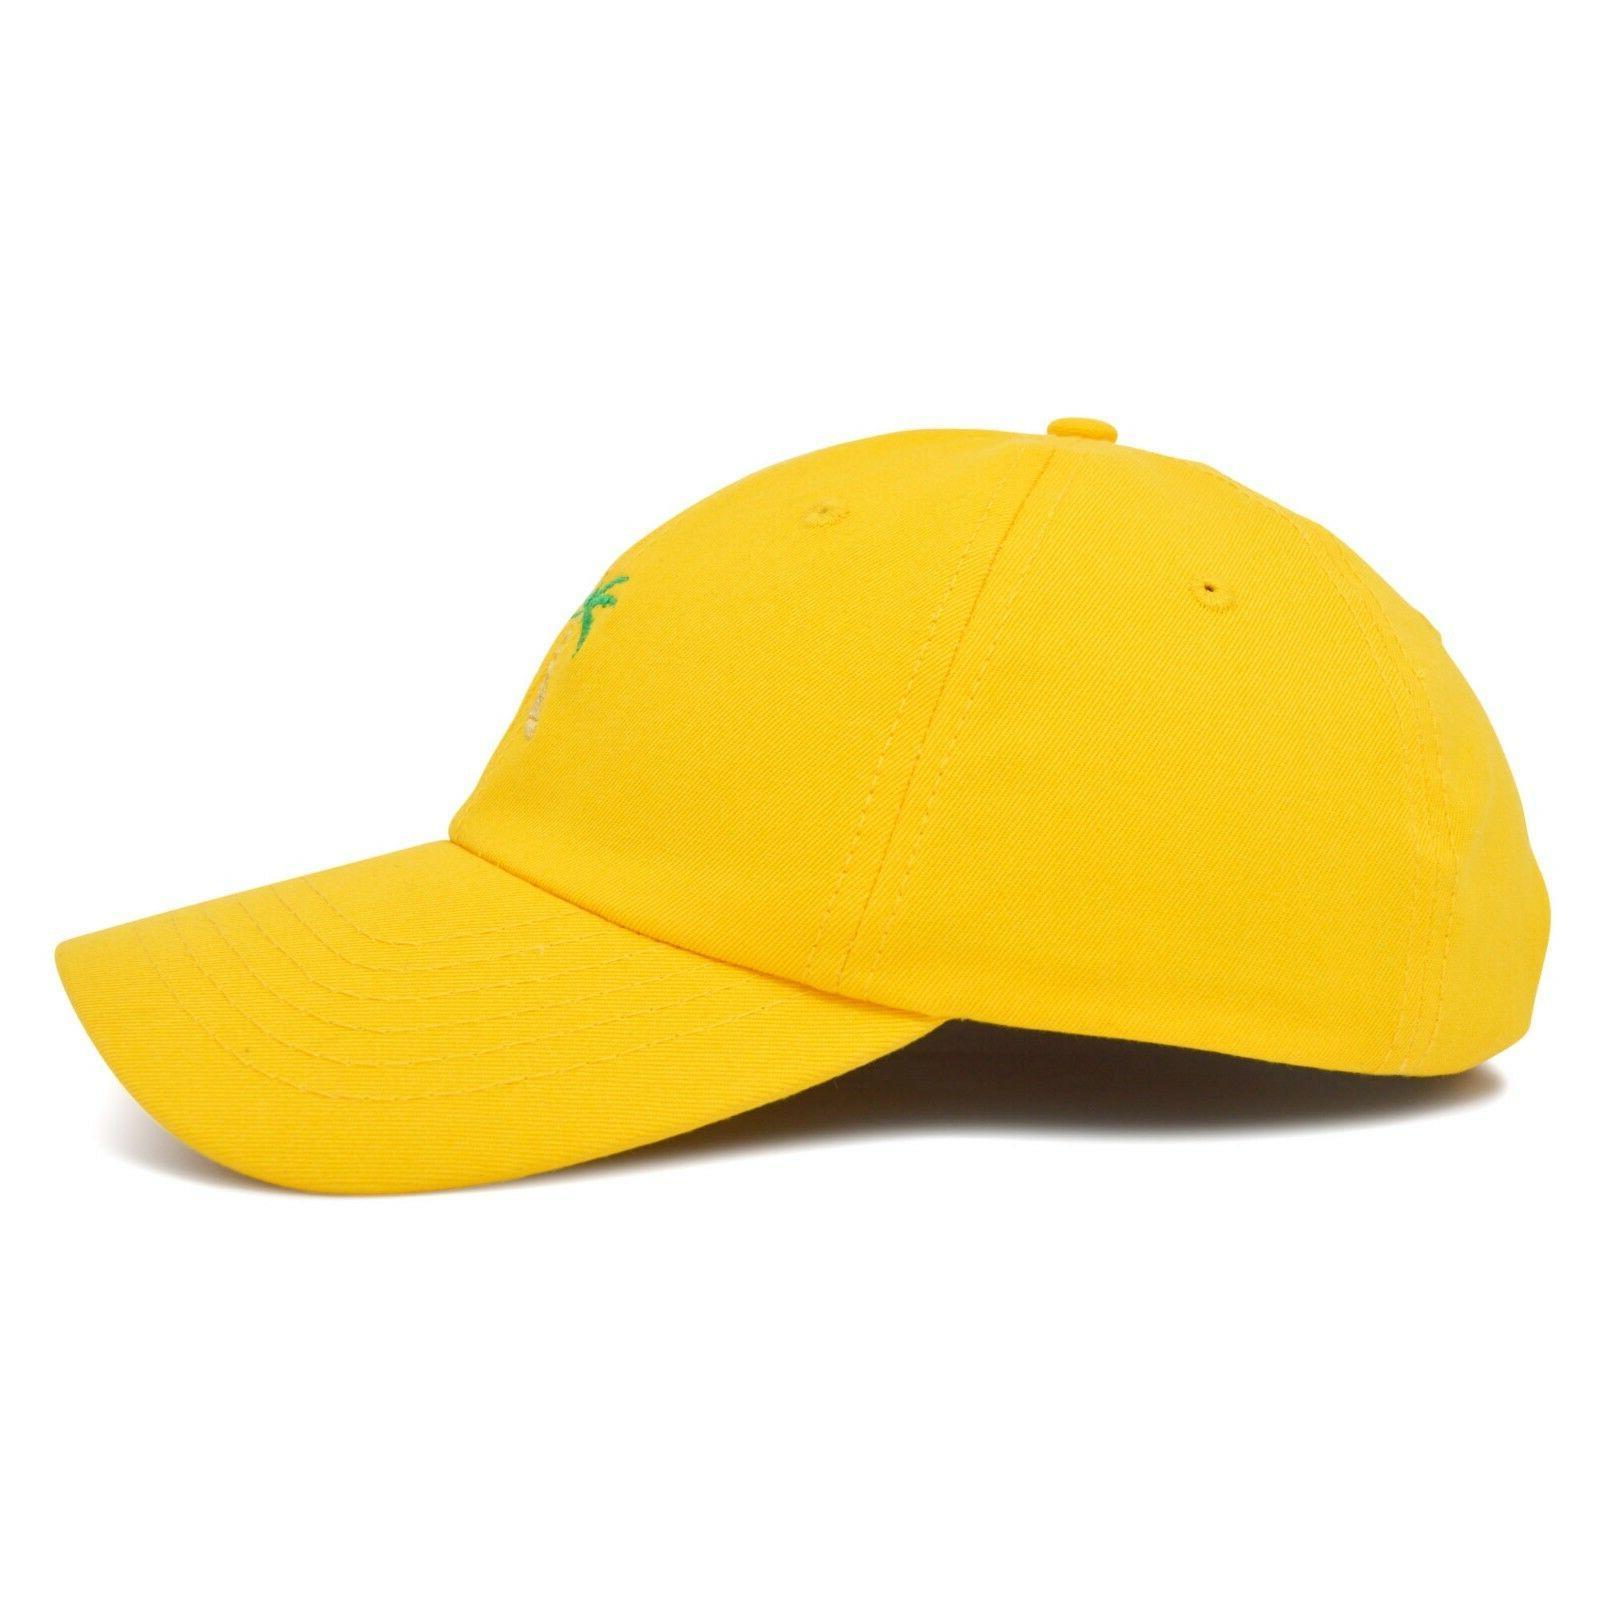 DALIX Dad Tree Baseball Cap Caps Cap in